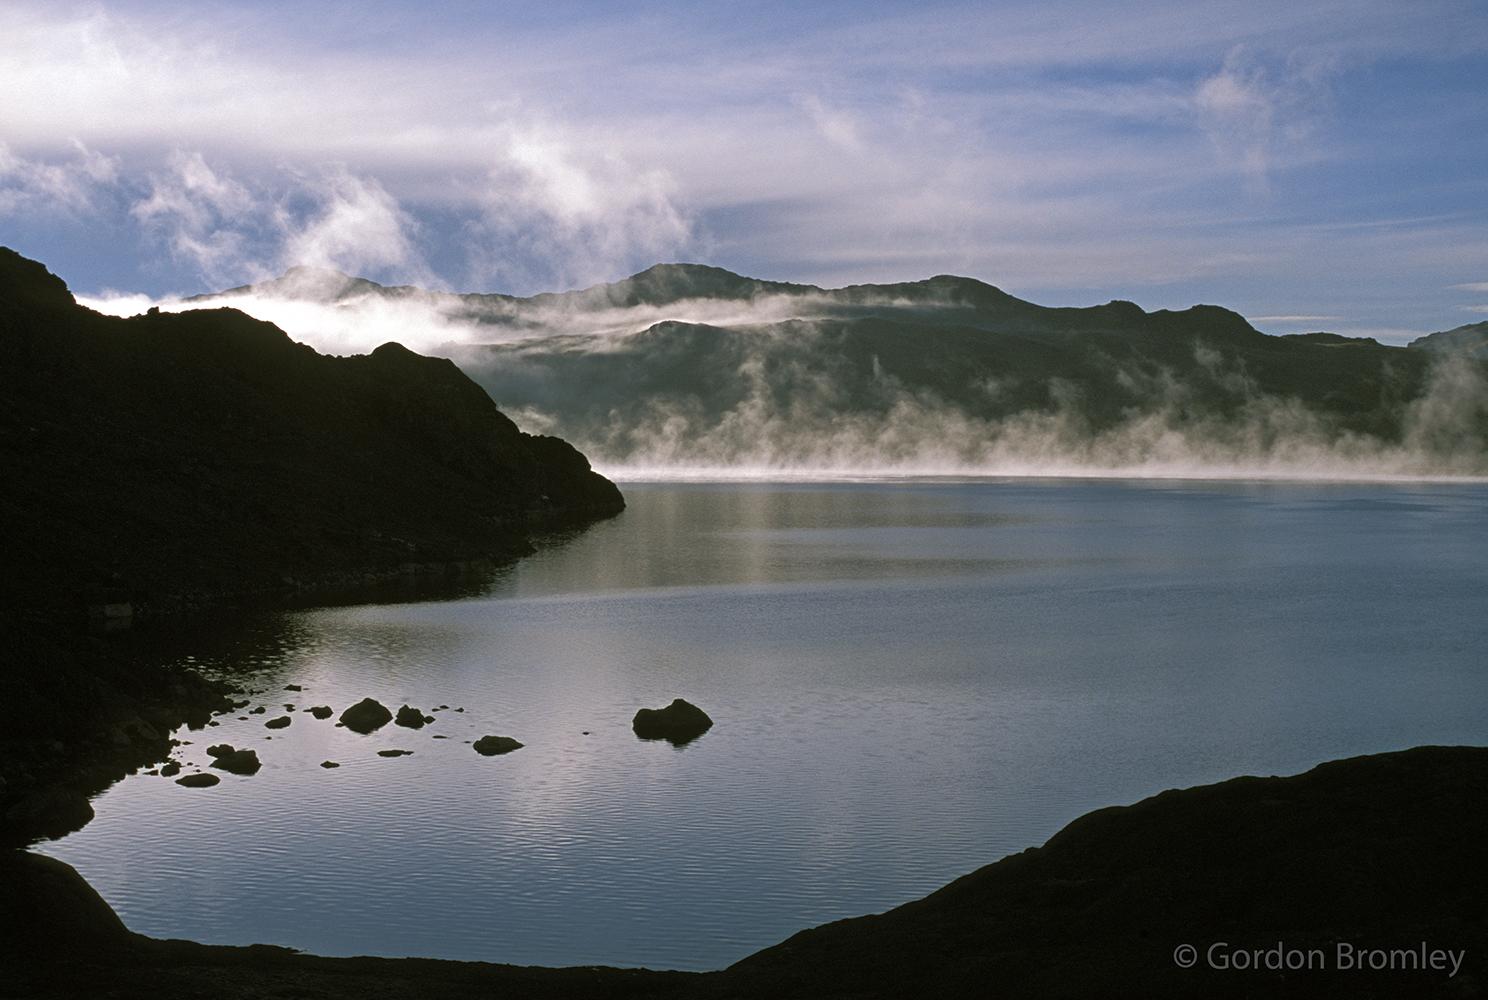 dawn mist on Chungara